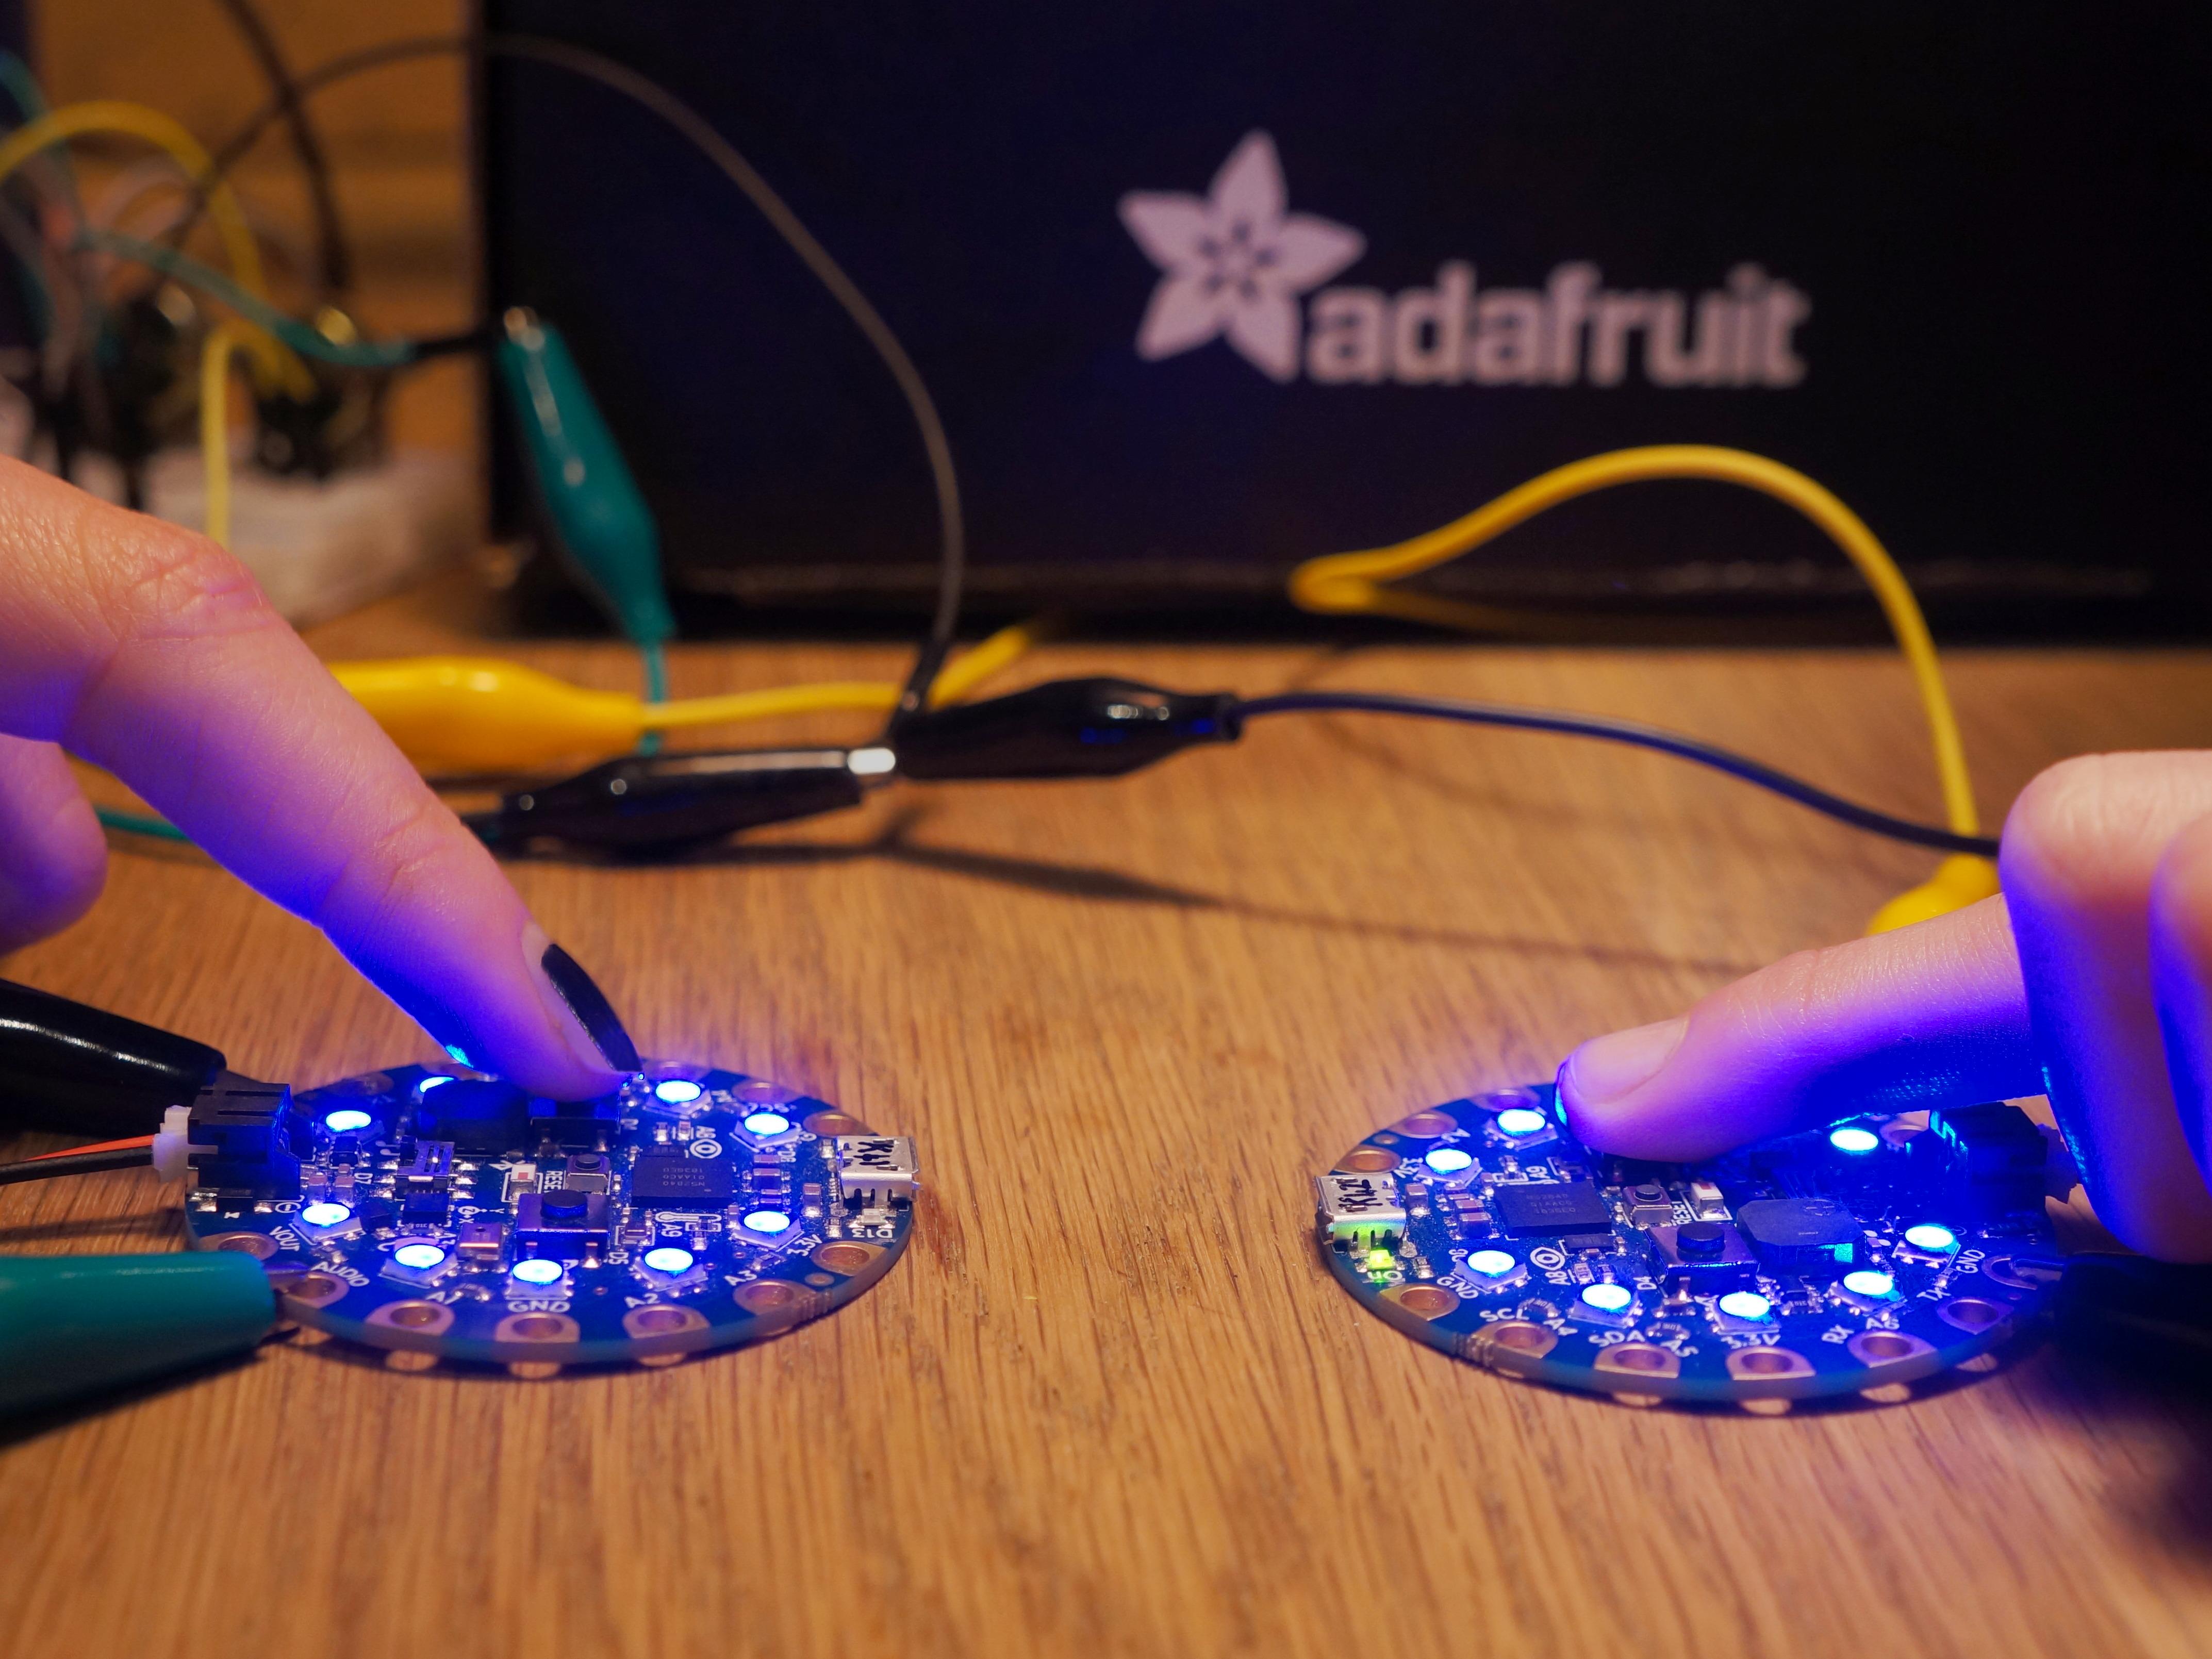 circuitpython_cpb-quick-draw-blueflash-woodentable-2000x1500-ii.jpg